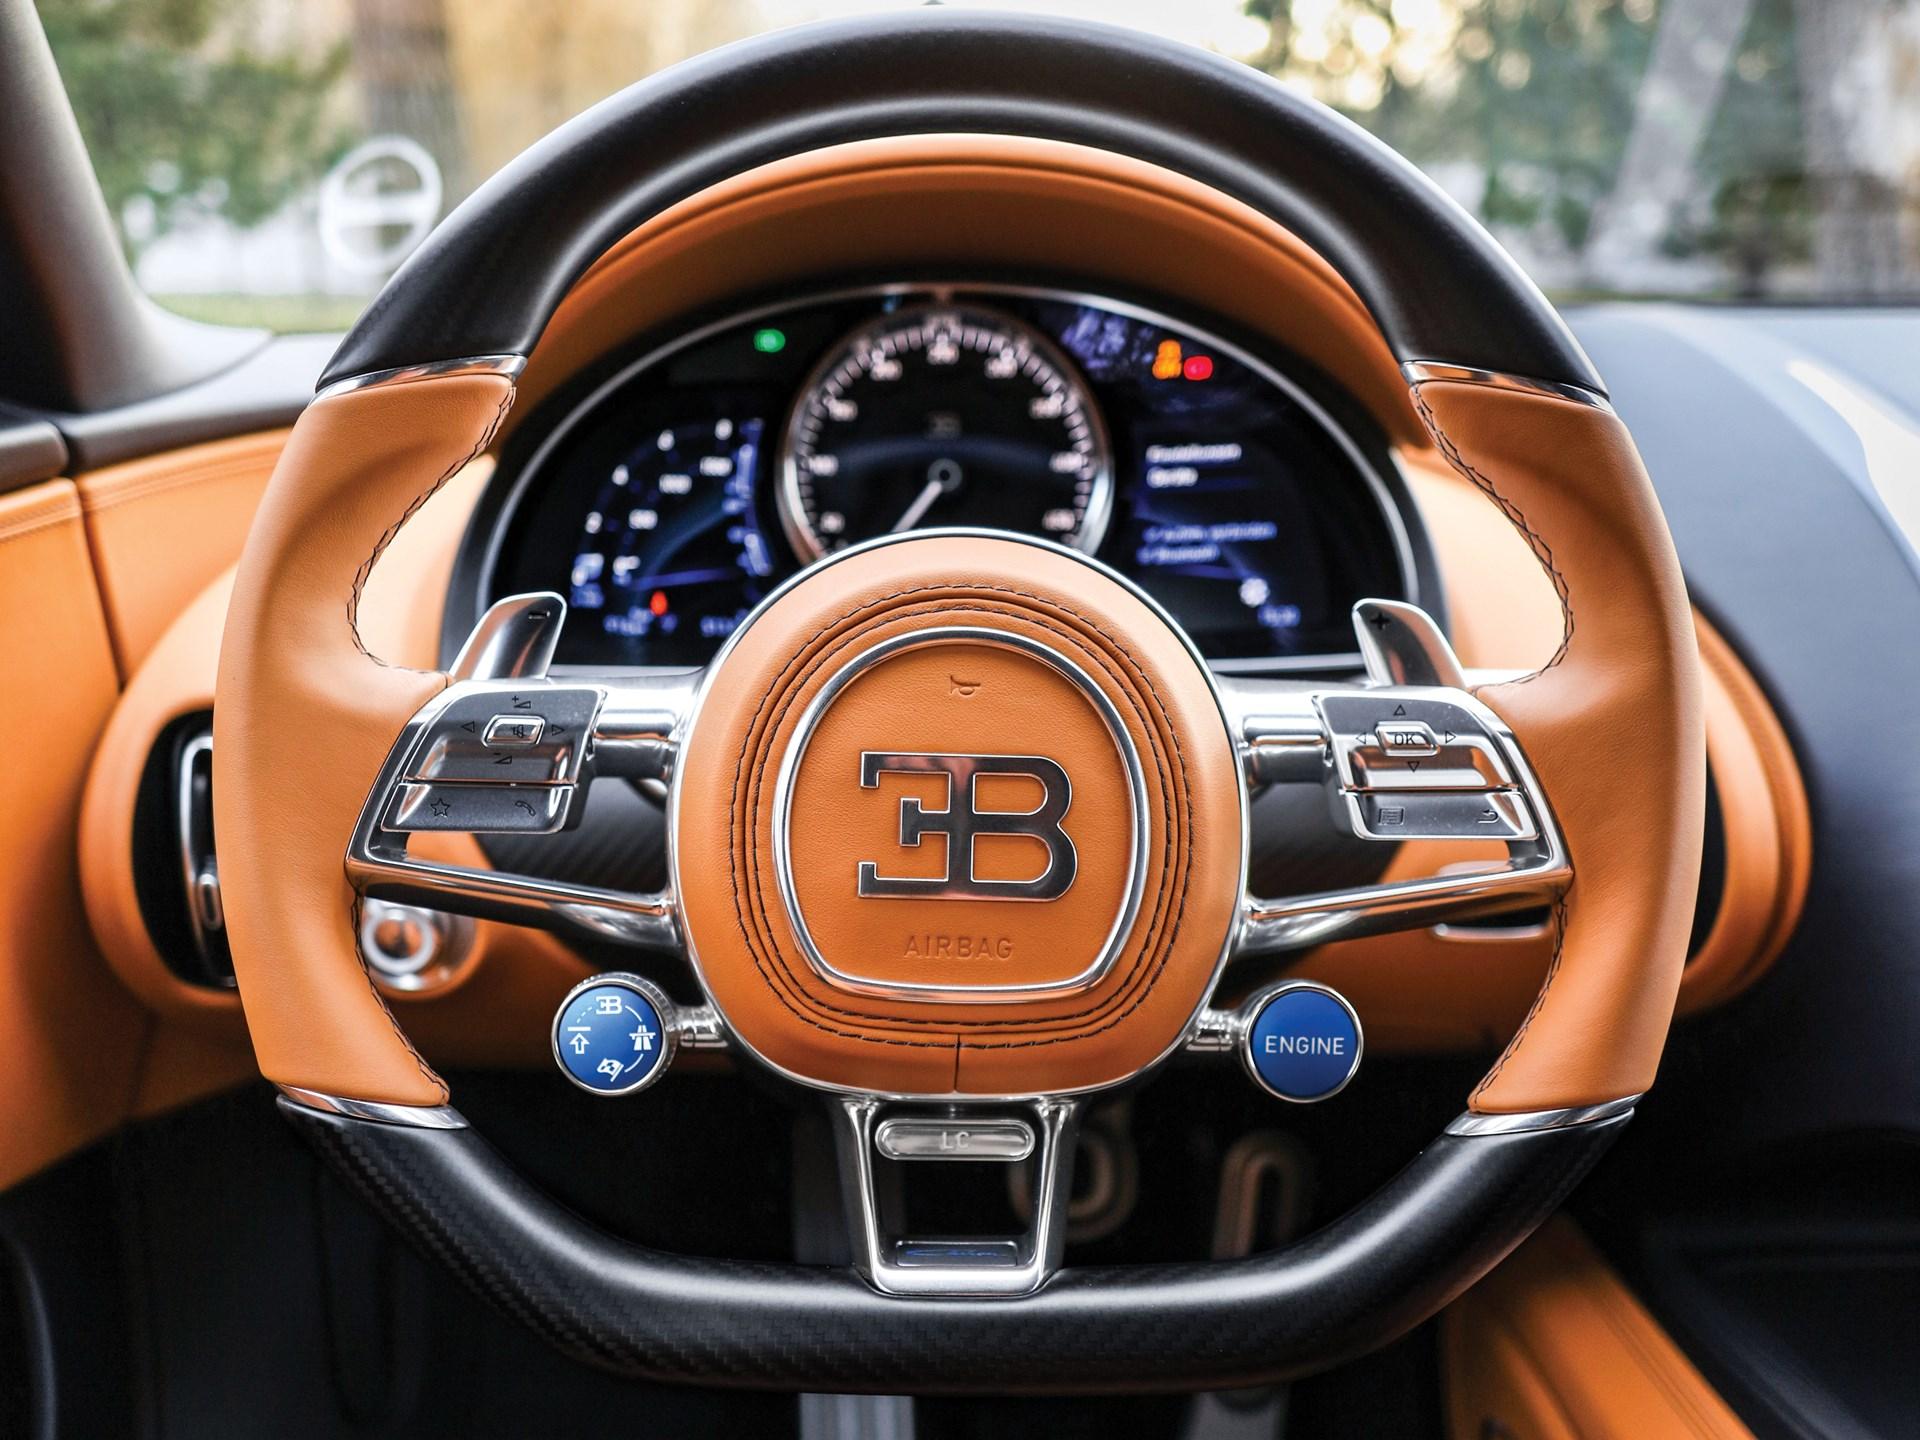 RM Sotheby's - 2017 Bugatti Chiron | Paris 2018